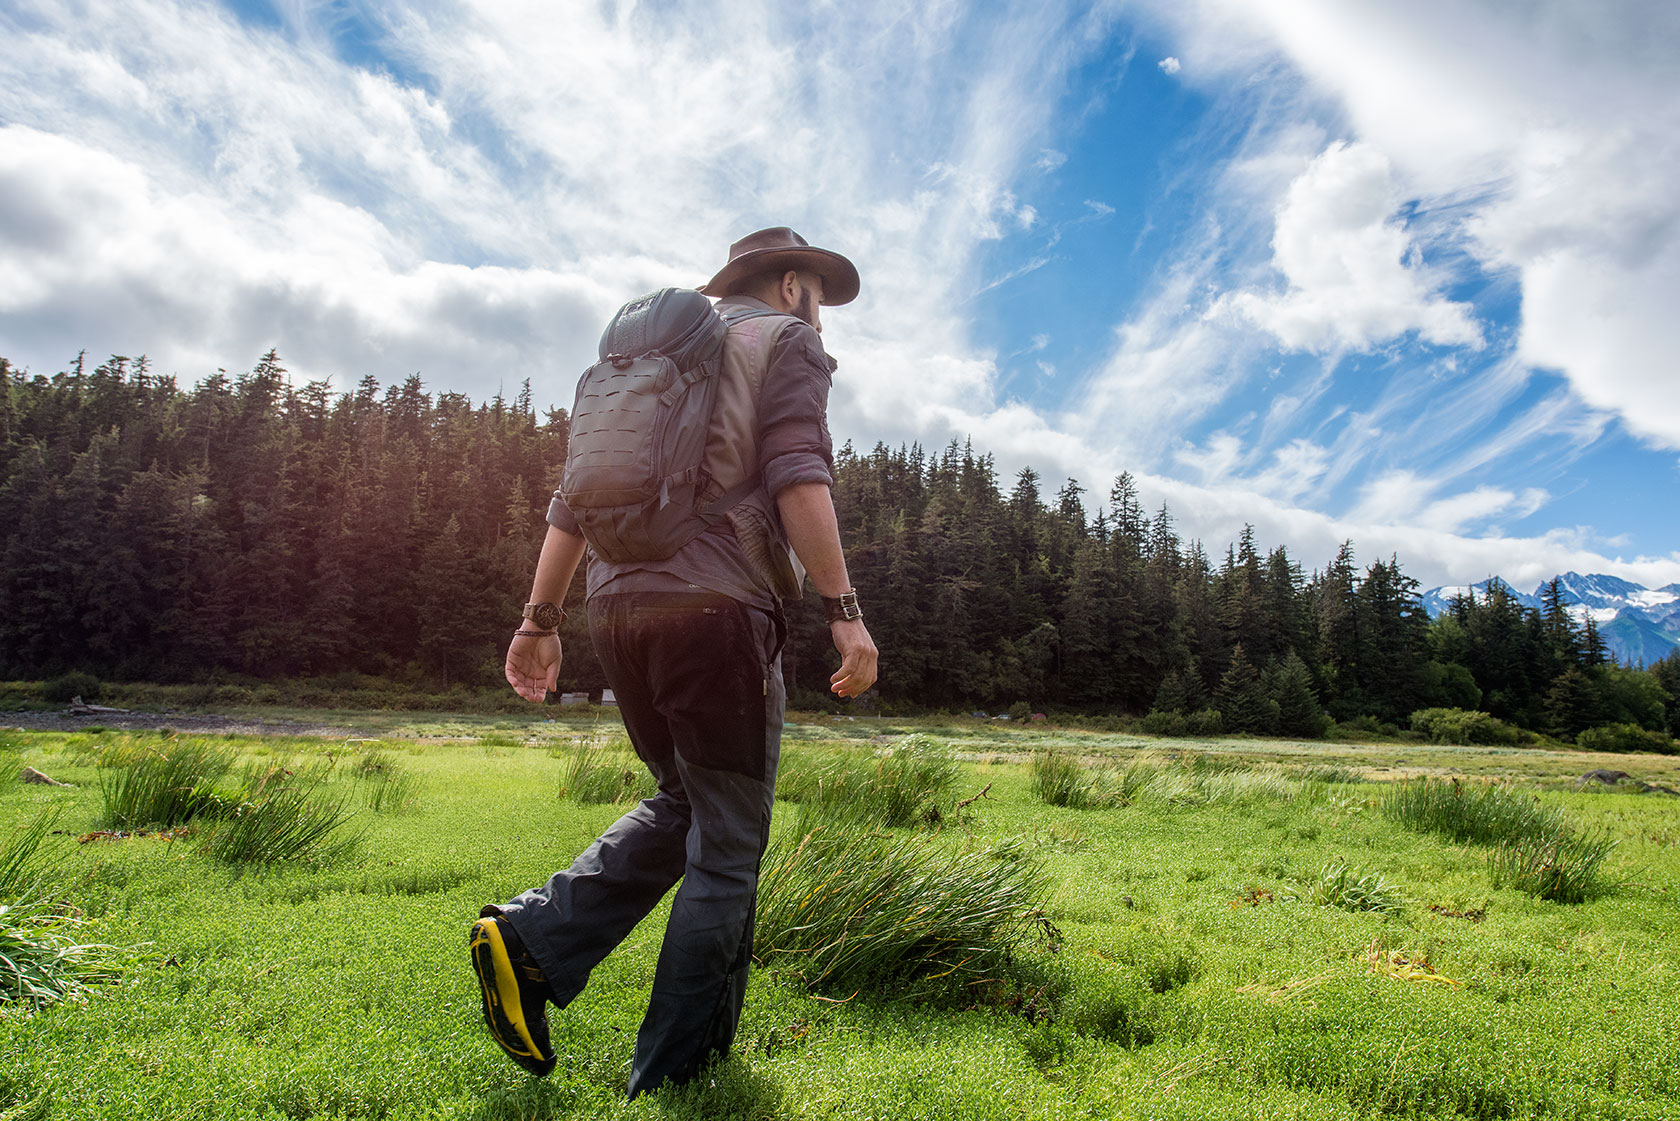 austin-trigg-brave-wilderness-alaska-BW-Coyote-Walks-Mud-Bay.jpg